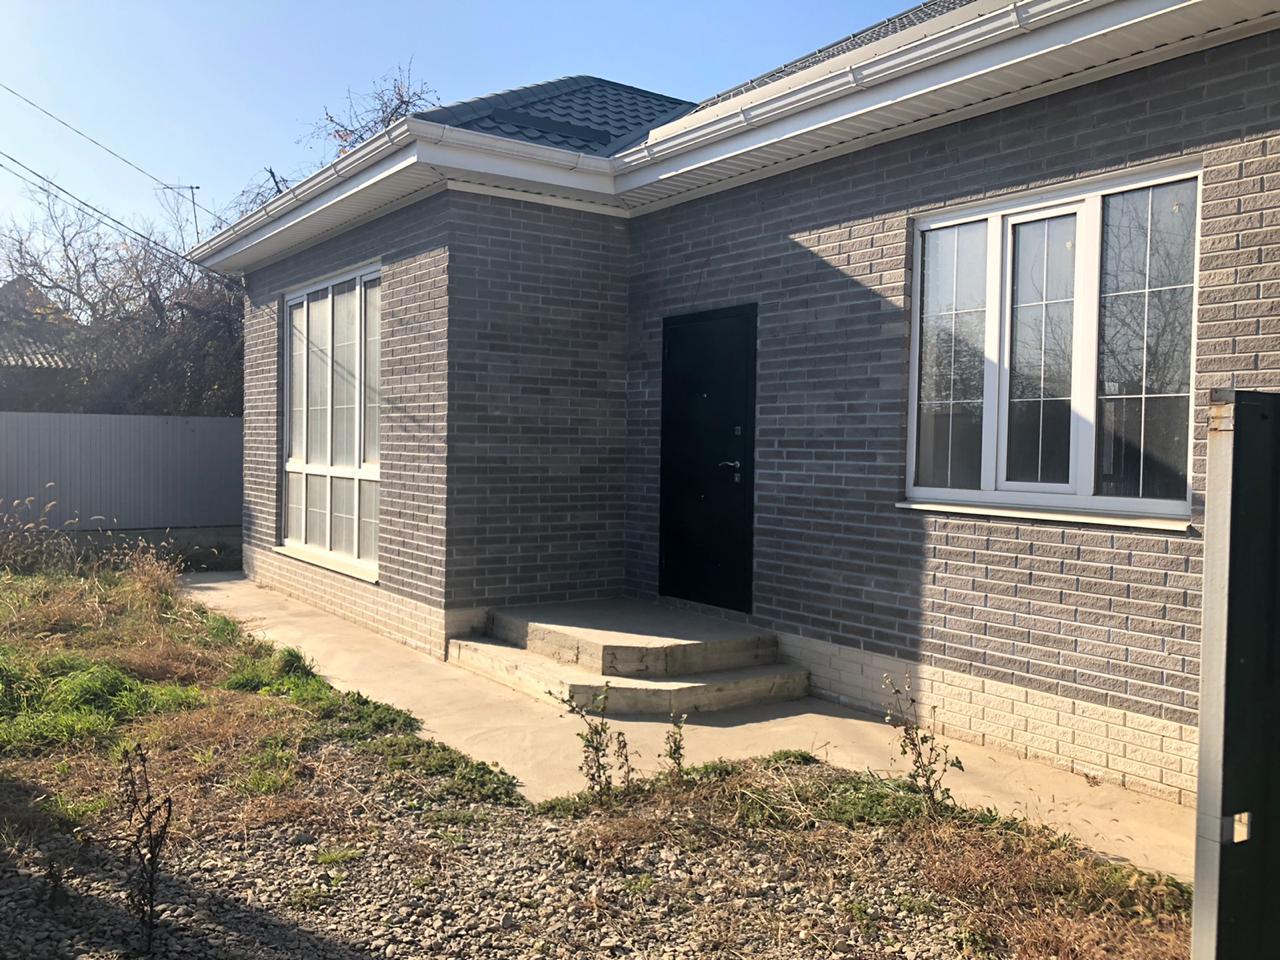 Дом, 119 кв.м., 5 соток ижс, 5700 т.р.